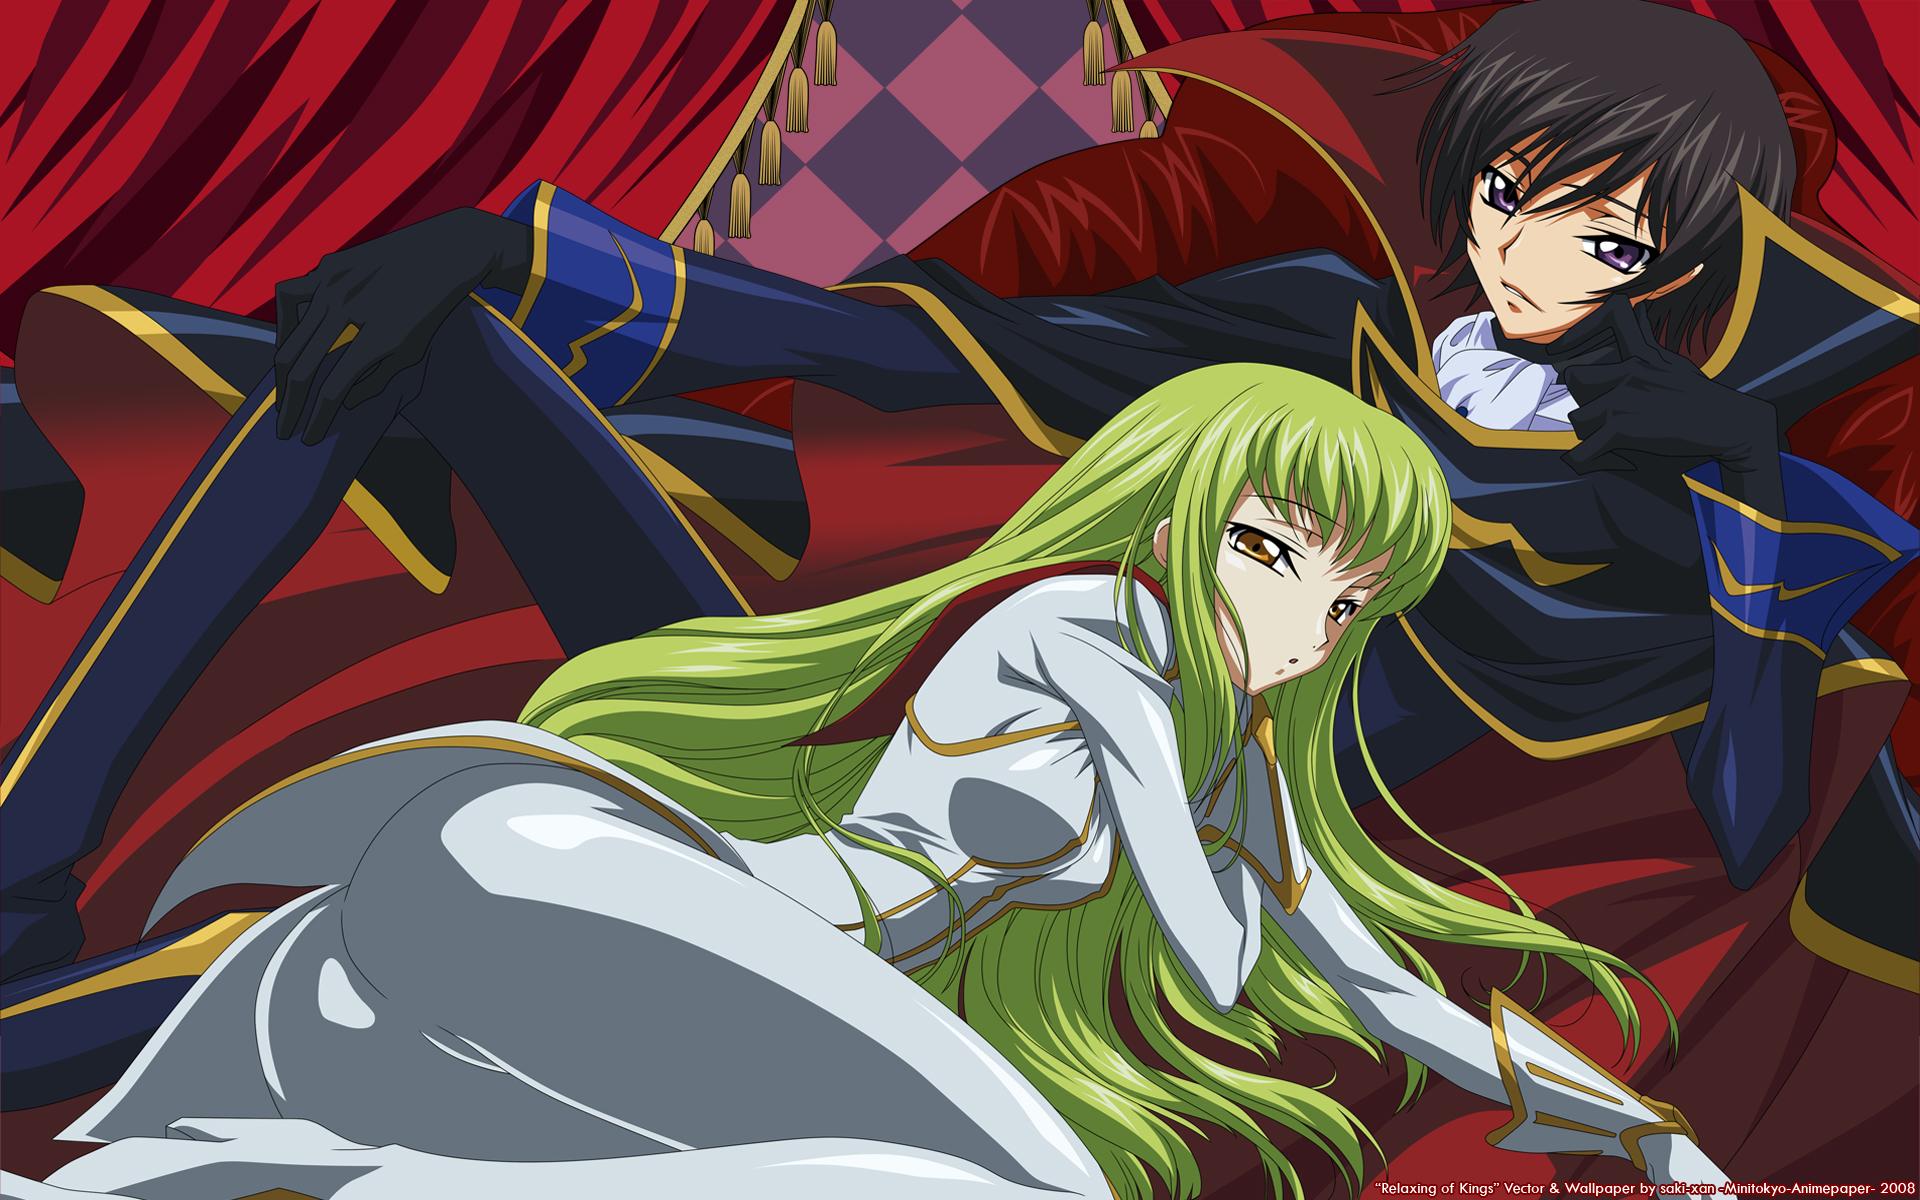 Code Geass 02 Warrior Anime HD Wallpaper Download Imagez Only 1920x1200